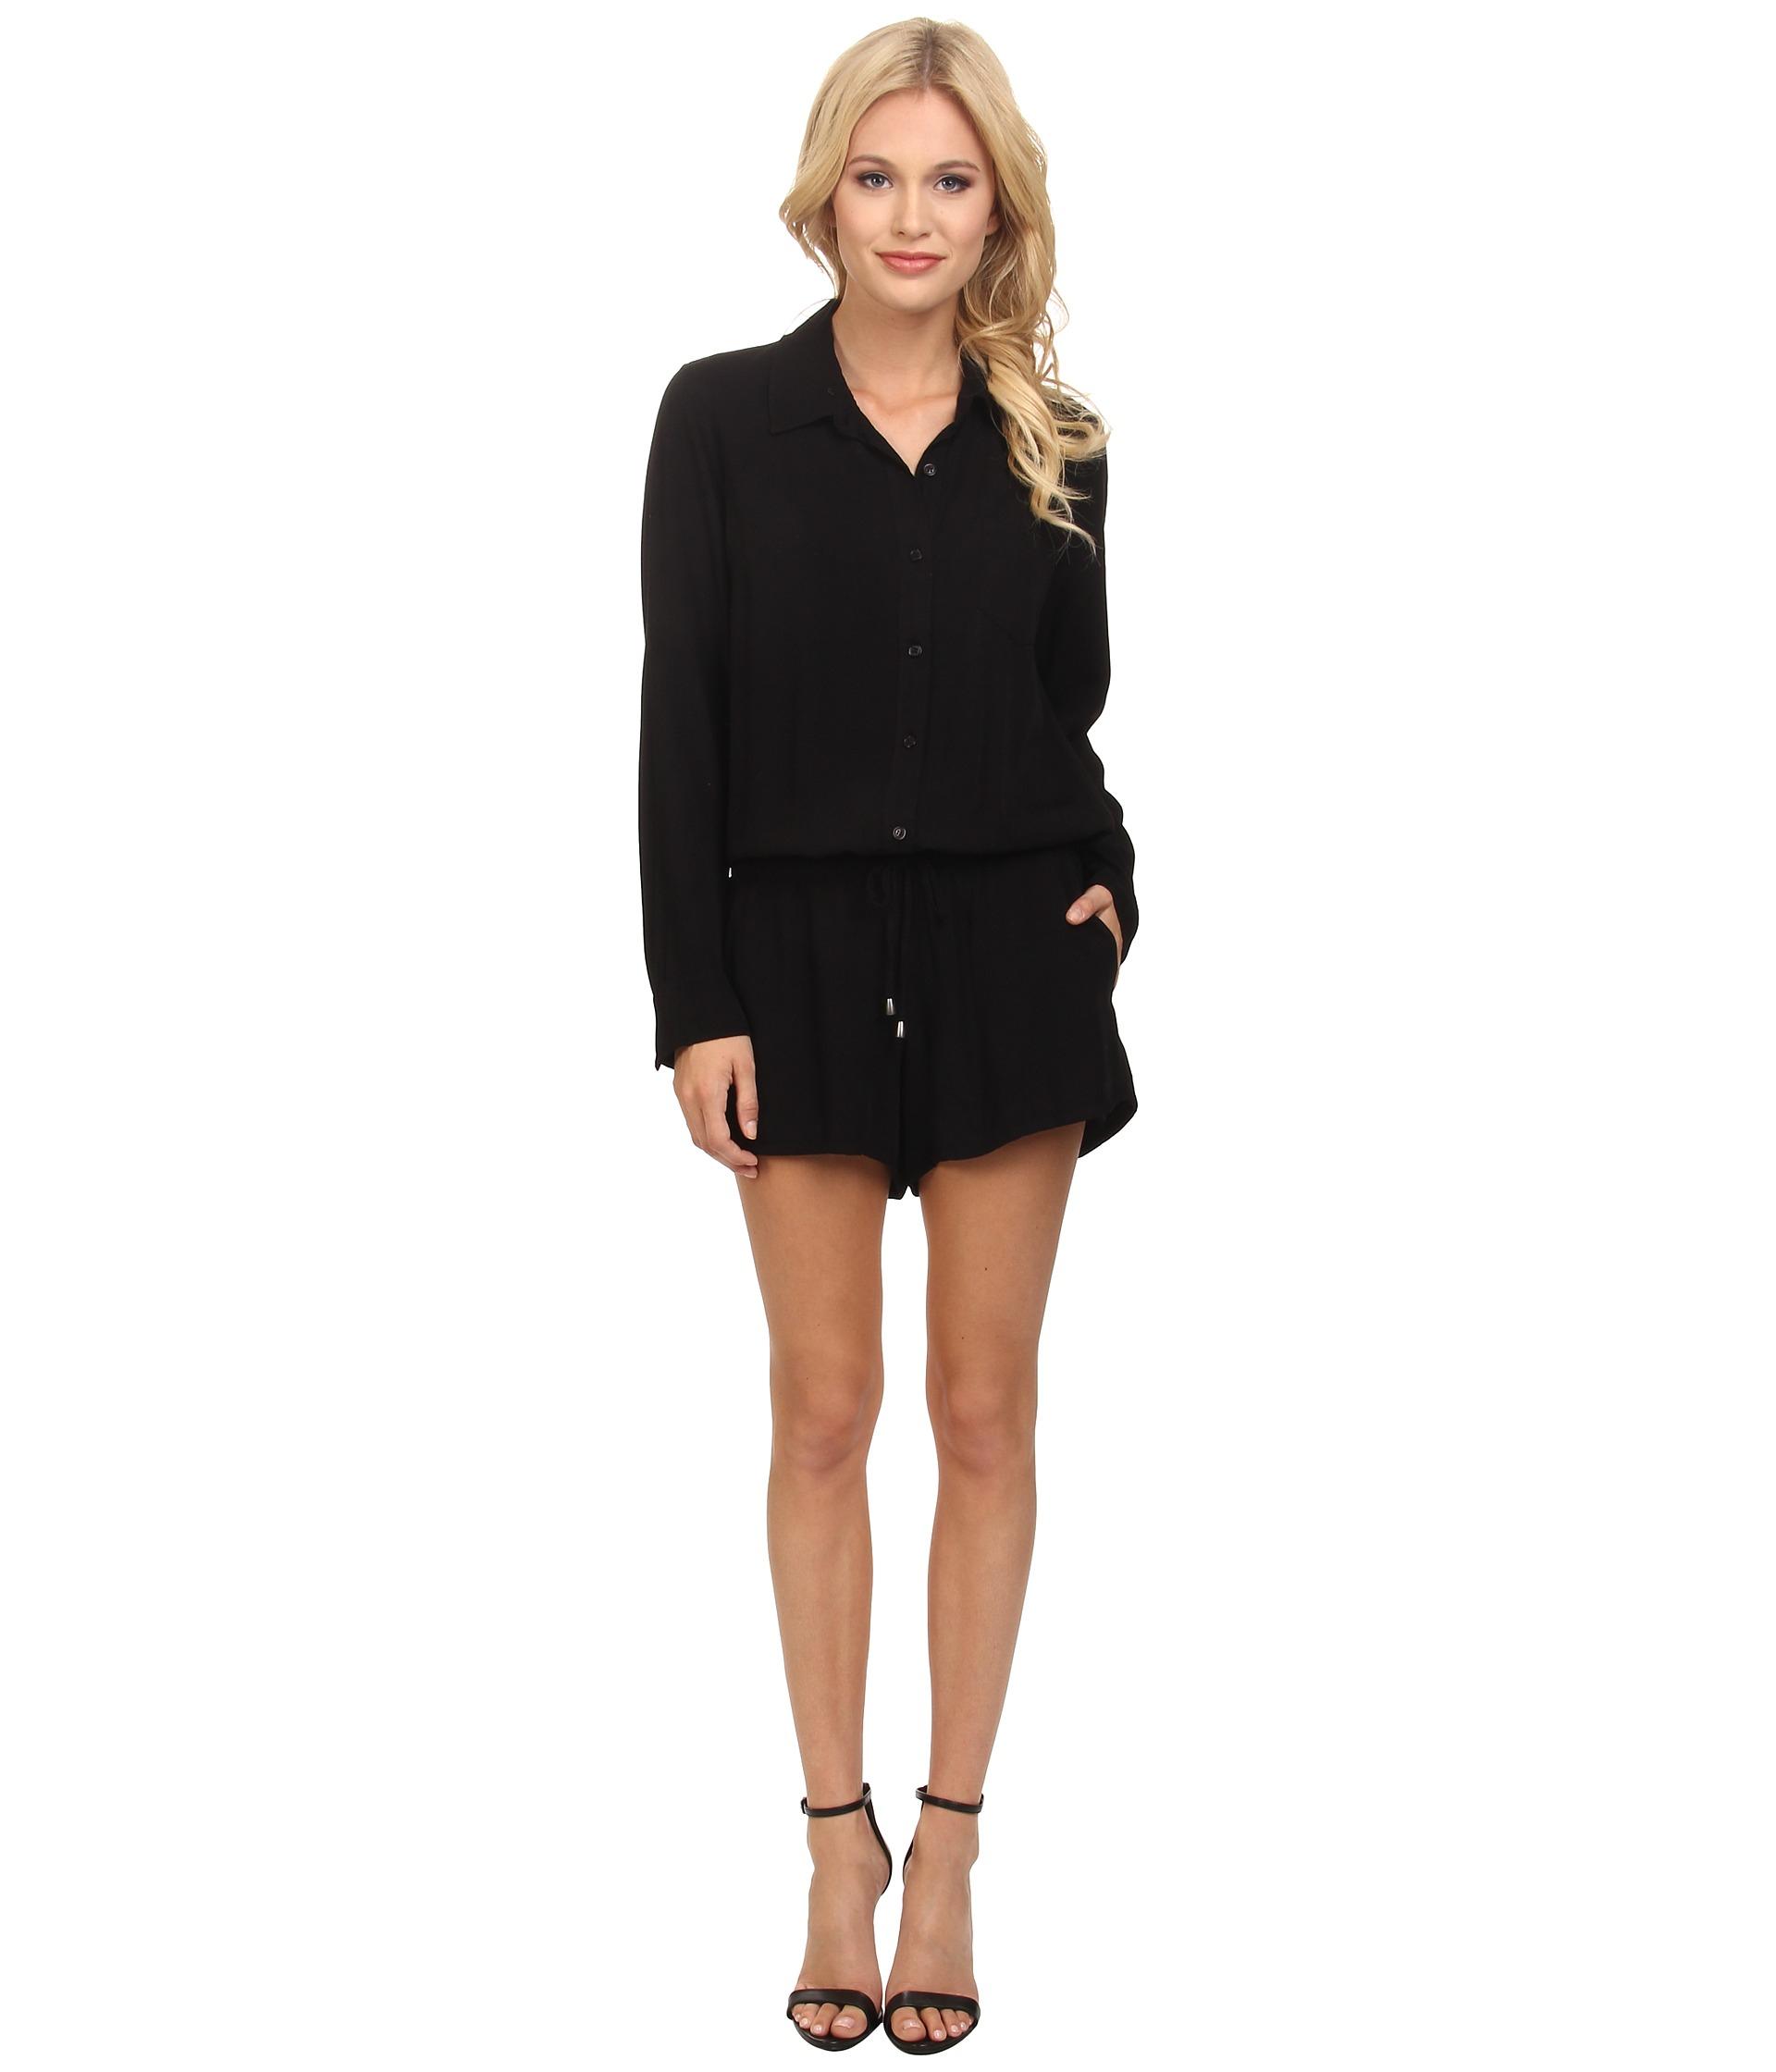 948a927af632 Lyst - Splendid Rayon Voile Jumpsuit in Black